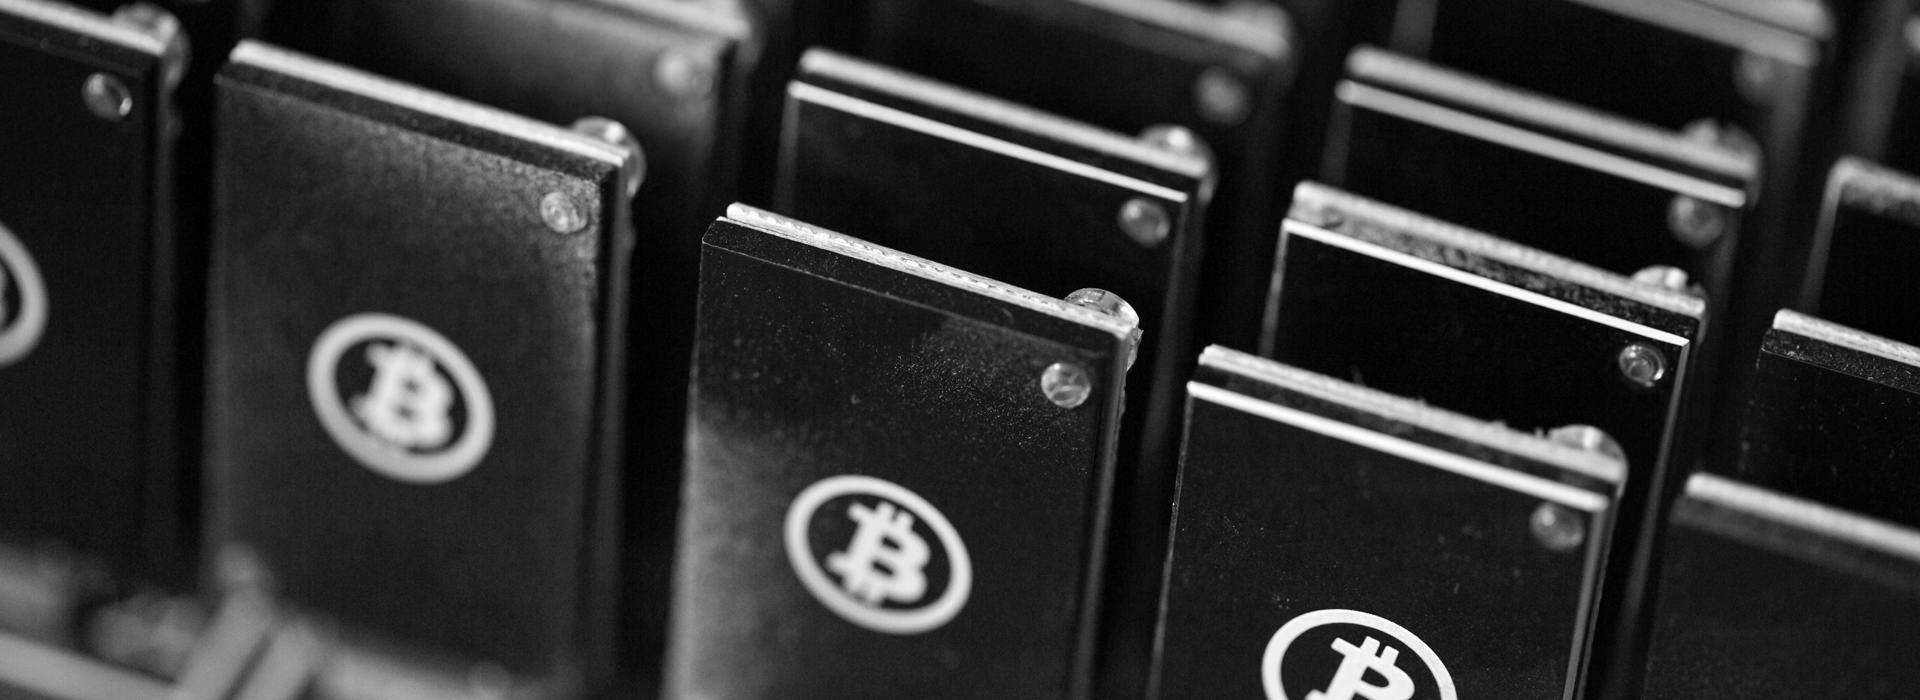 Koparka kryptowalut Bitcoin, Zcash, Ethereum